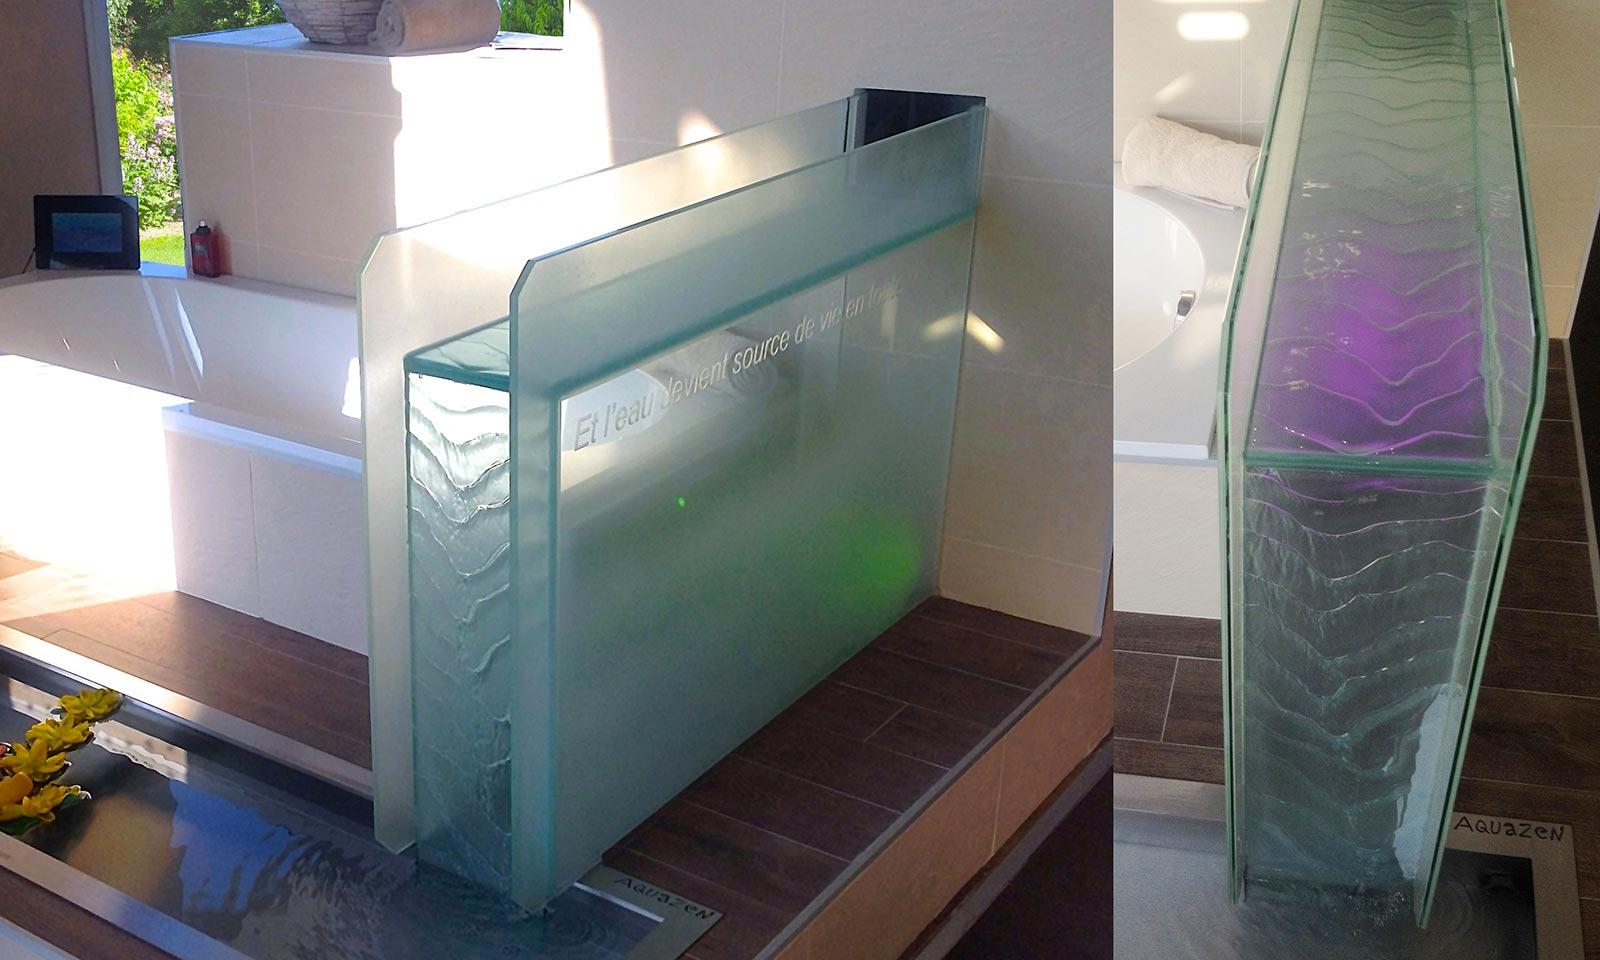 fabriquer sa salle de bain construire niche salle de bain avec davaus net fabriquer des id es. Black Bedroom Furniture Sets. Home Design Ideas